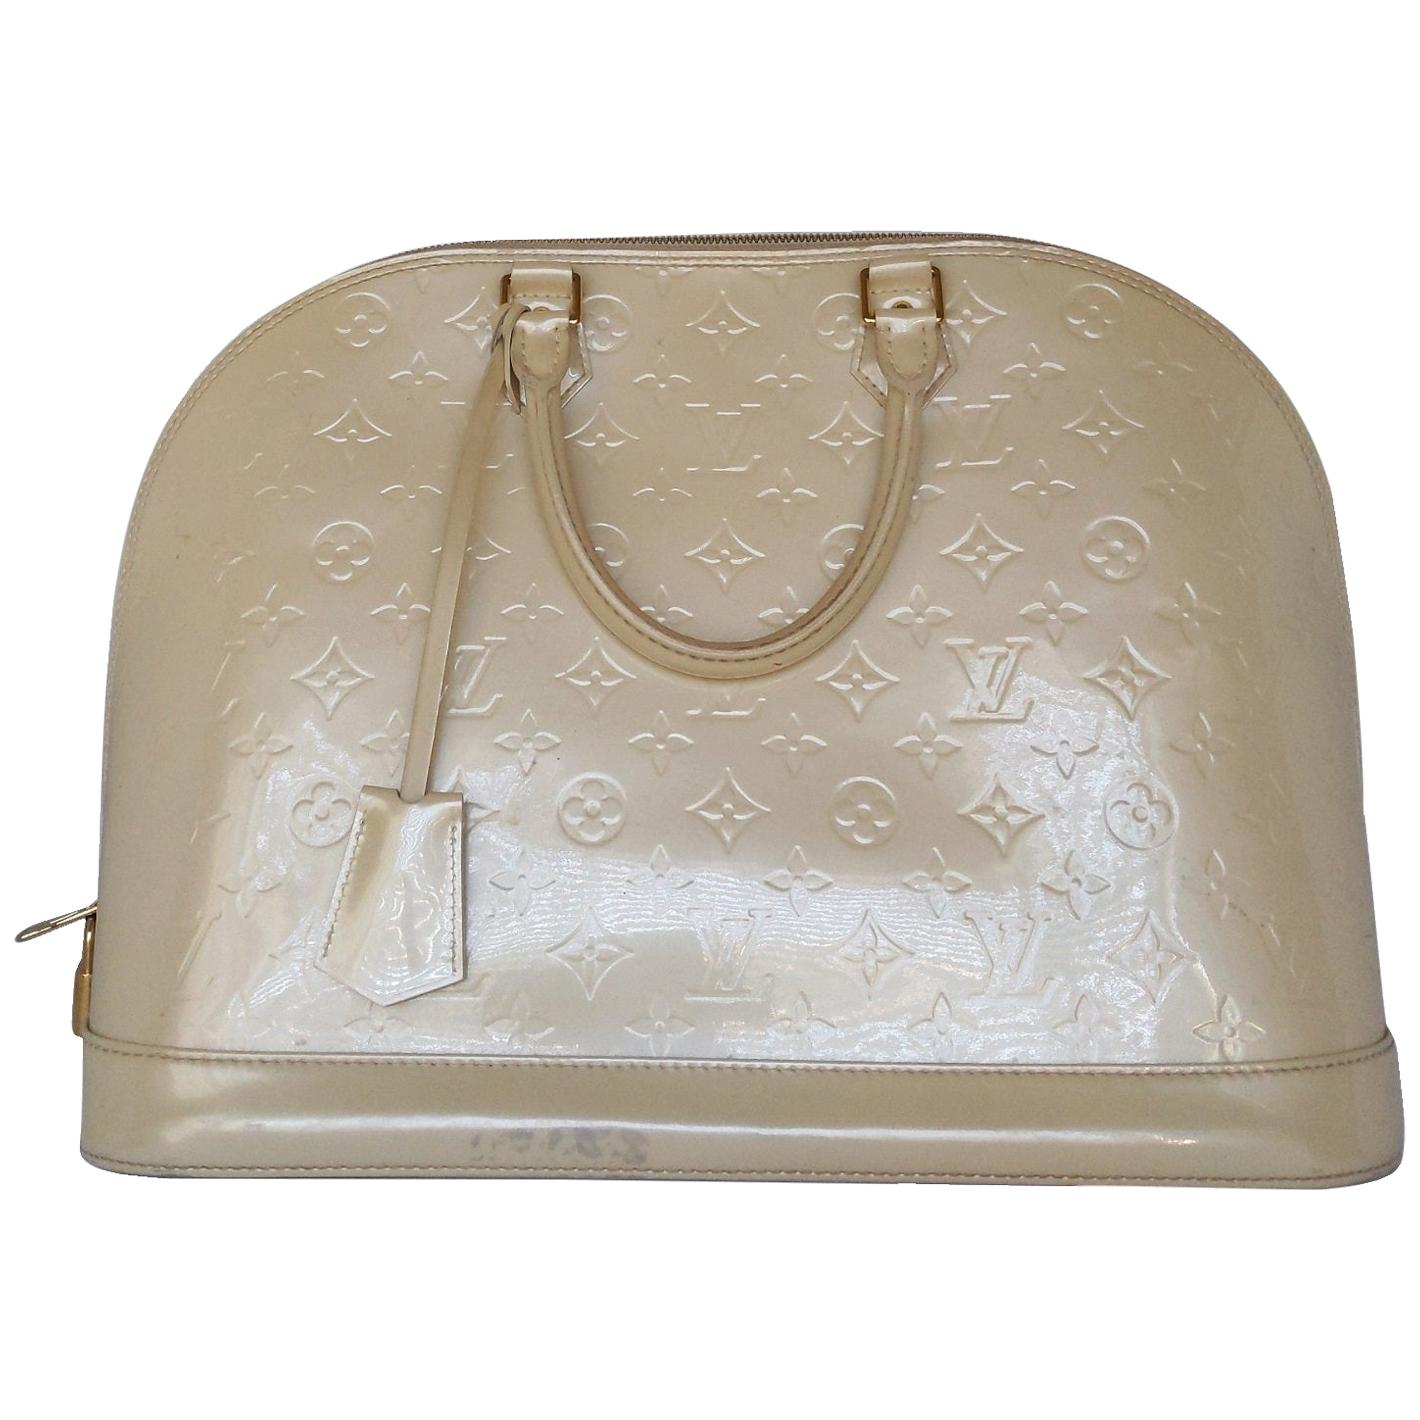 Louis Vuitton Dune Monogram Vernis Alma GM Handbag Satchel